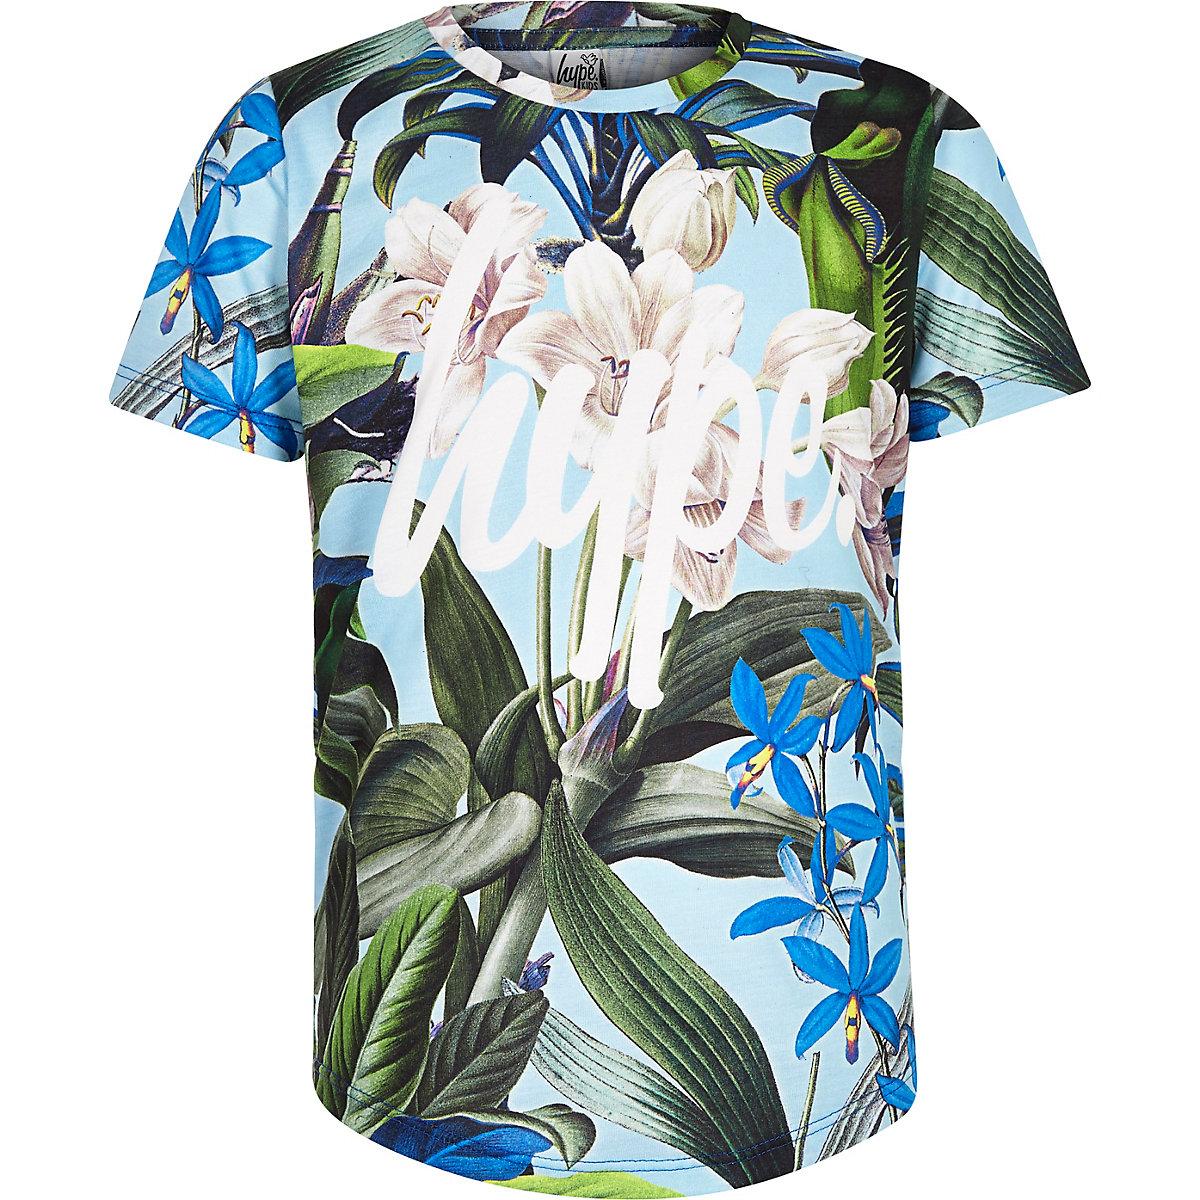 Boys blue Hype tropical print T-shirt